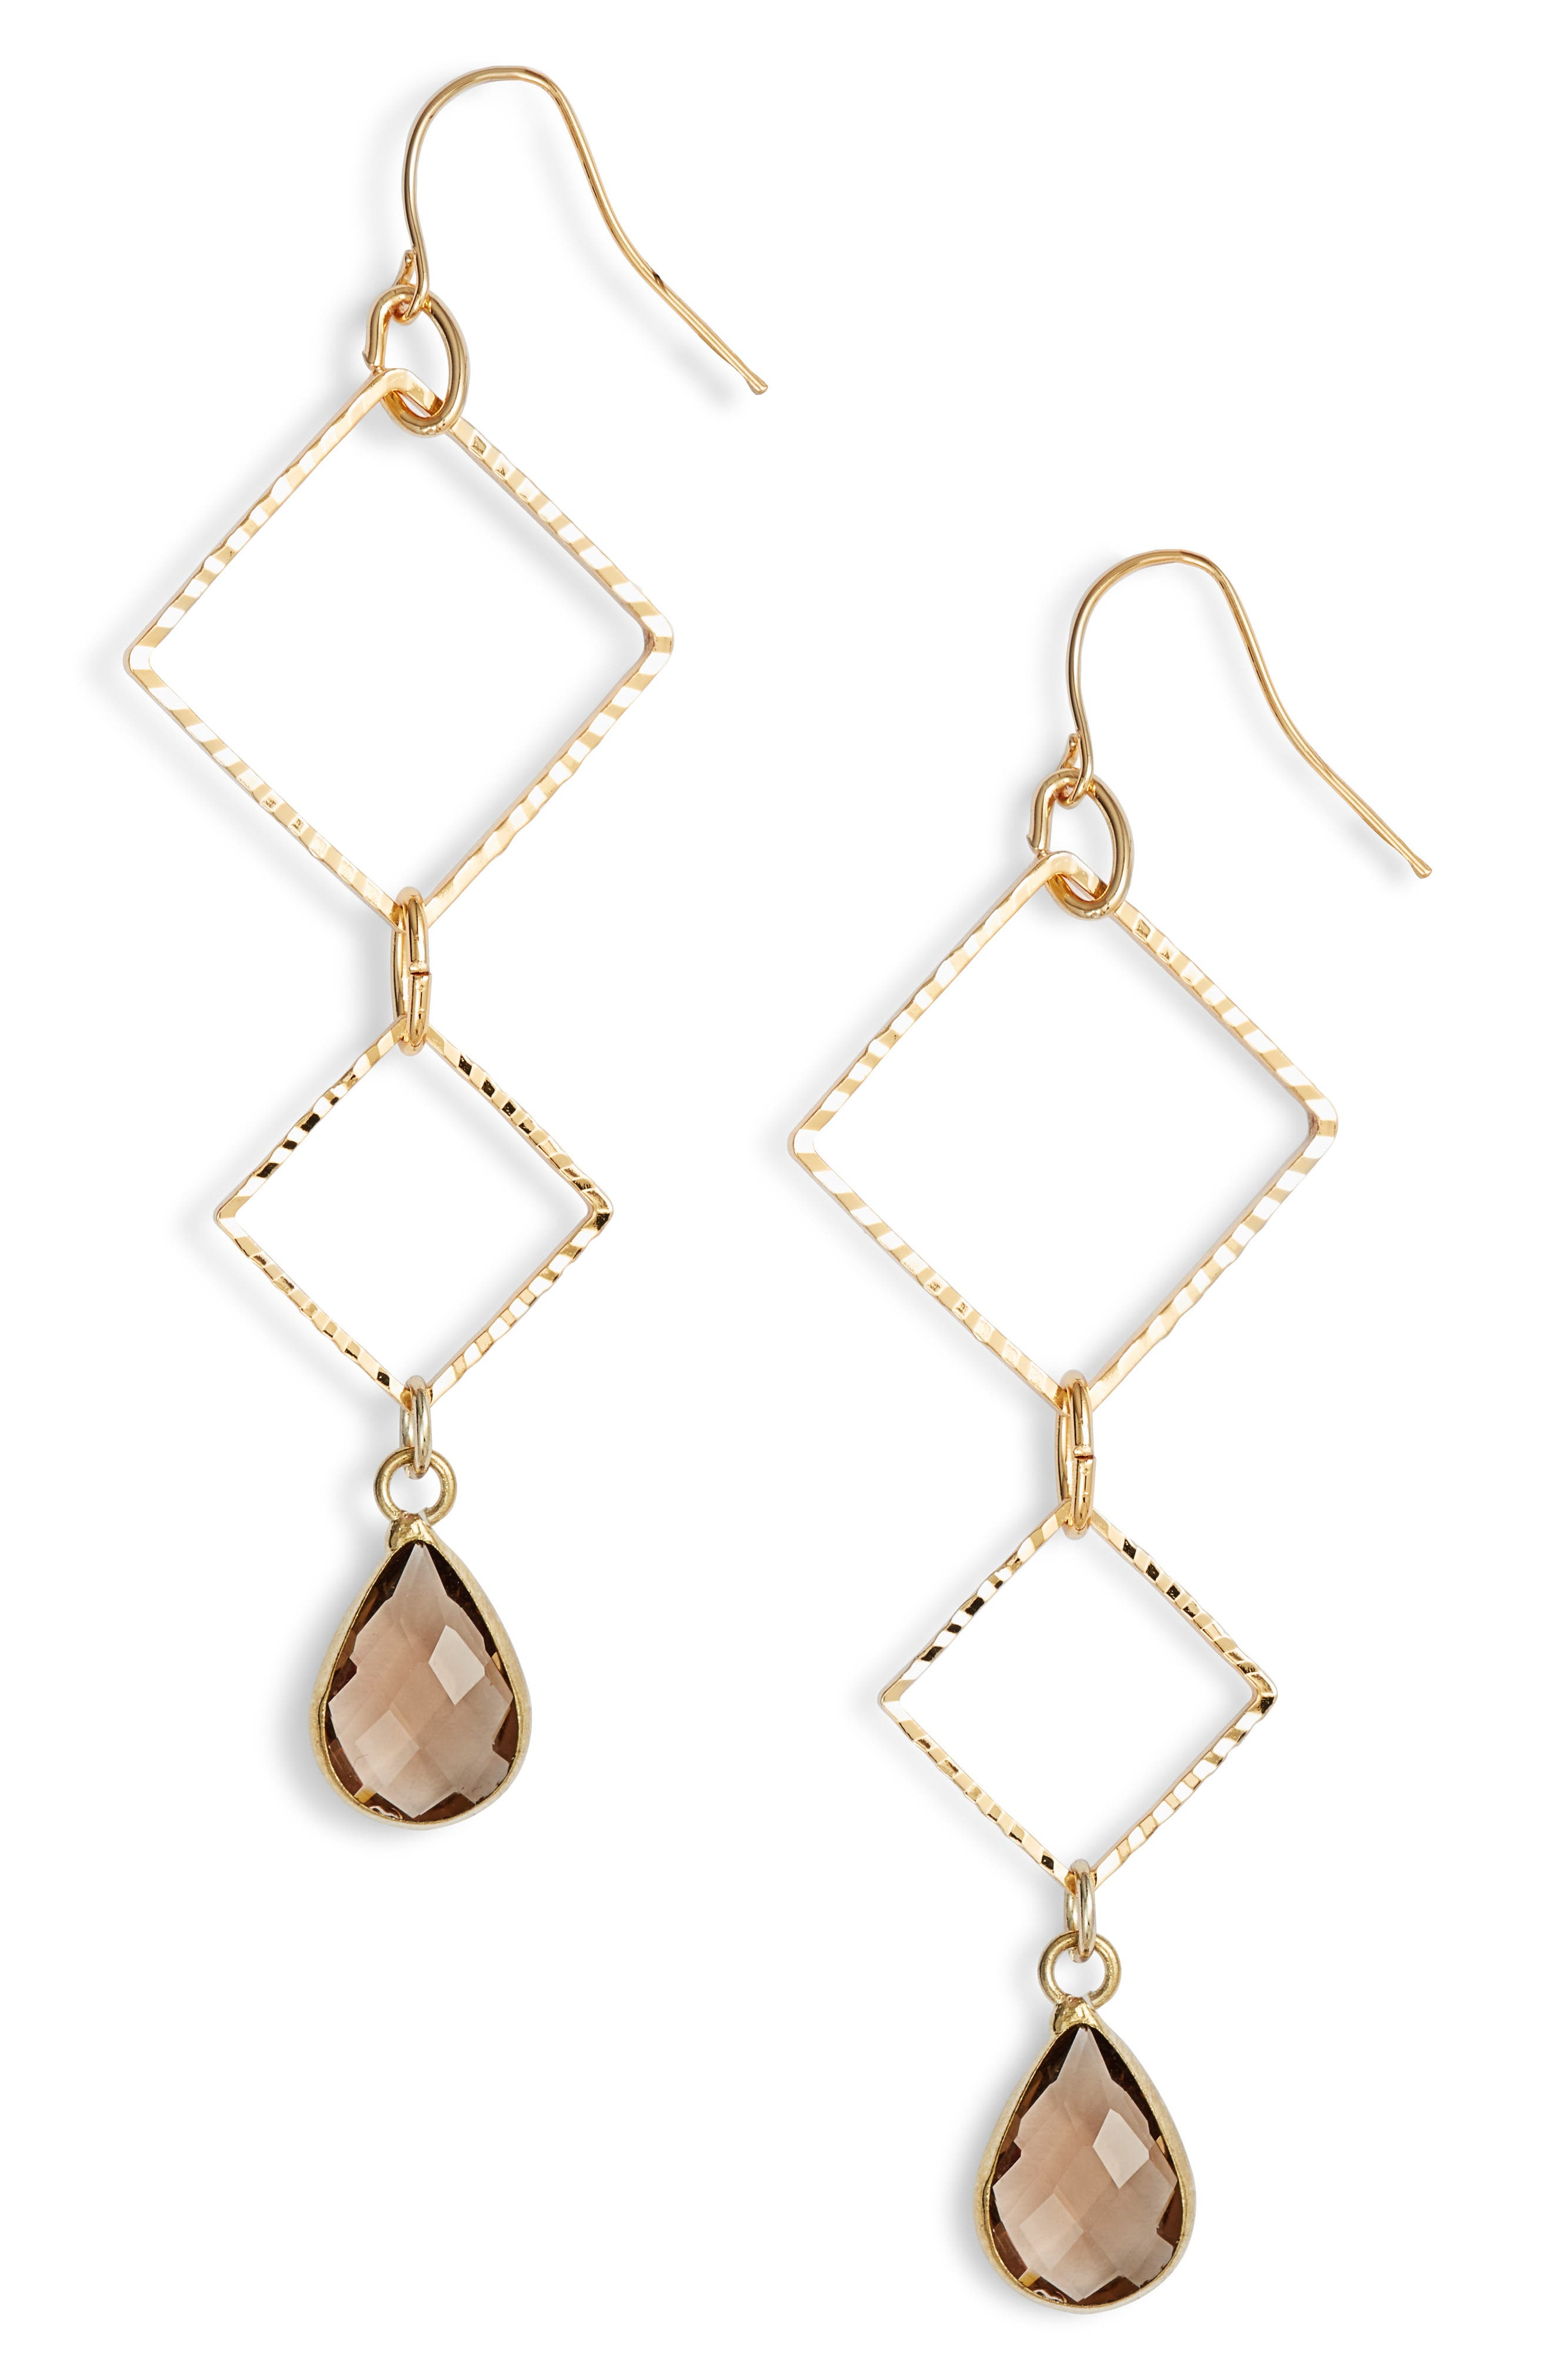 ELISE M. Callie Triangle Drop Earrings in Gold/ Brown